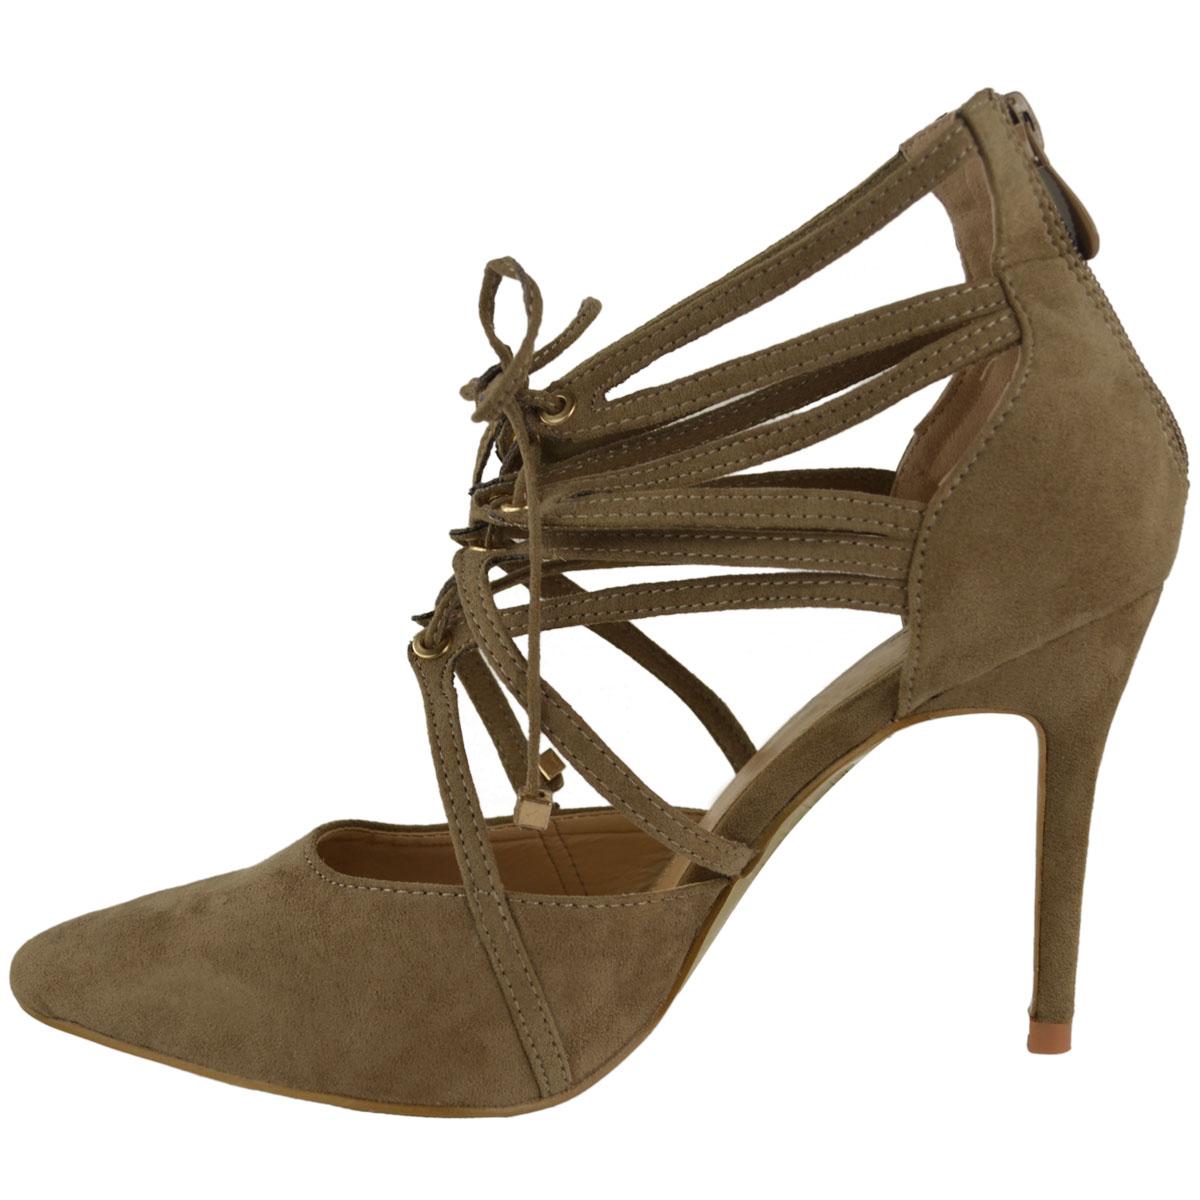 damen ausgeschnitten hoher absatz schuhe gladiator sandalen gr e ebay. Black Bedroom Furniture Sets. Home Design Ideas